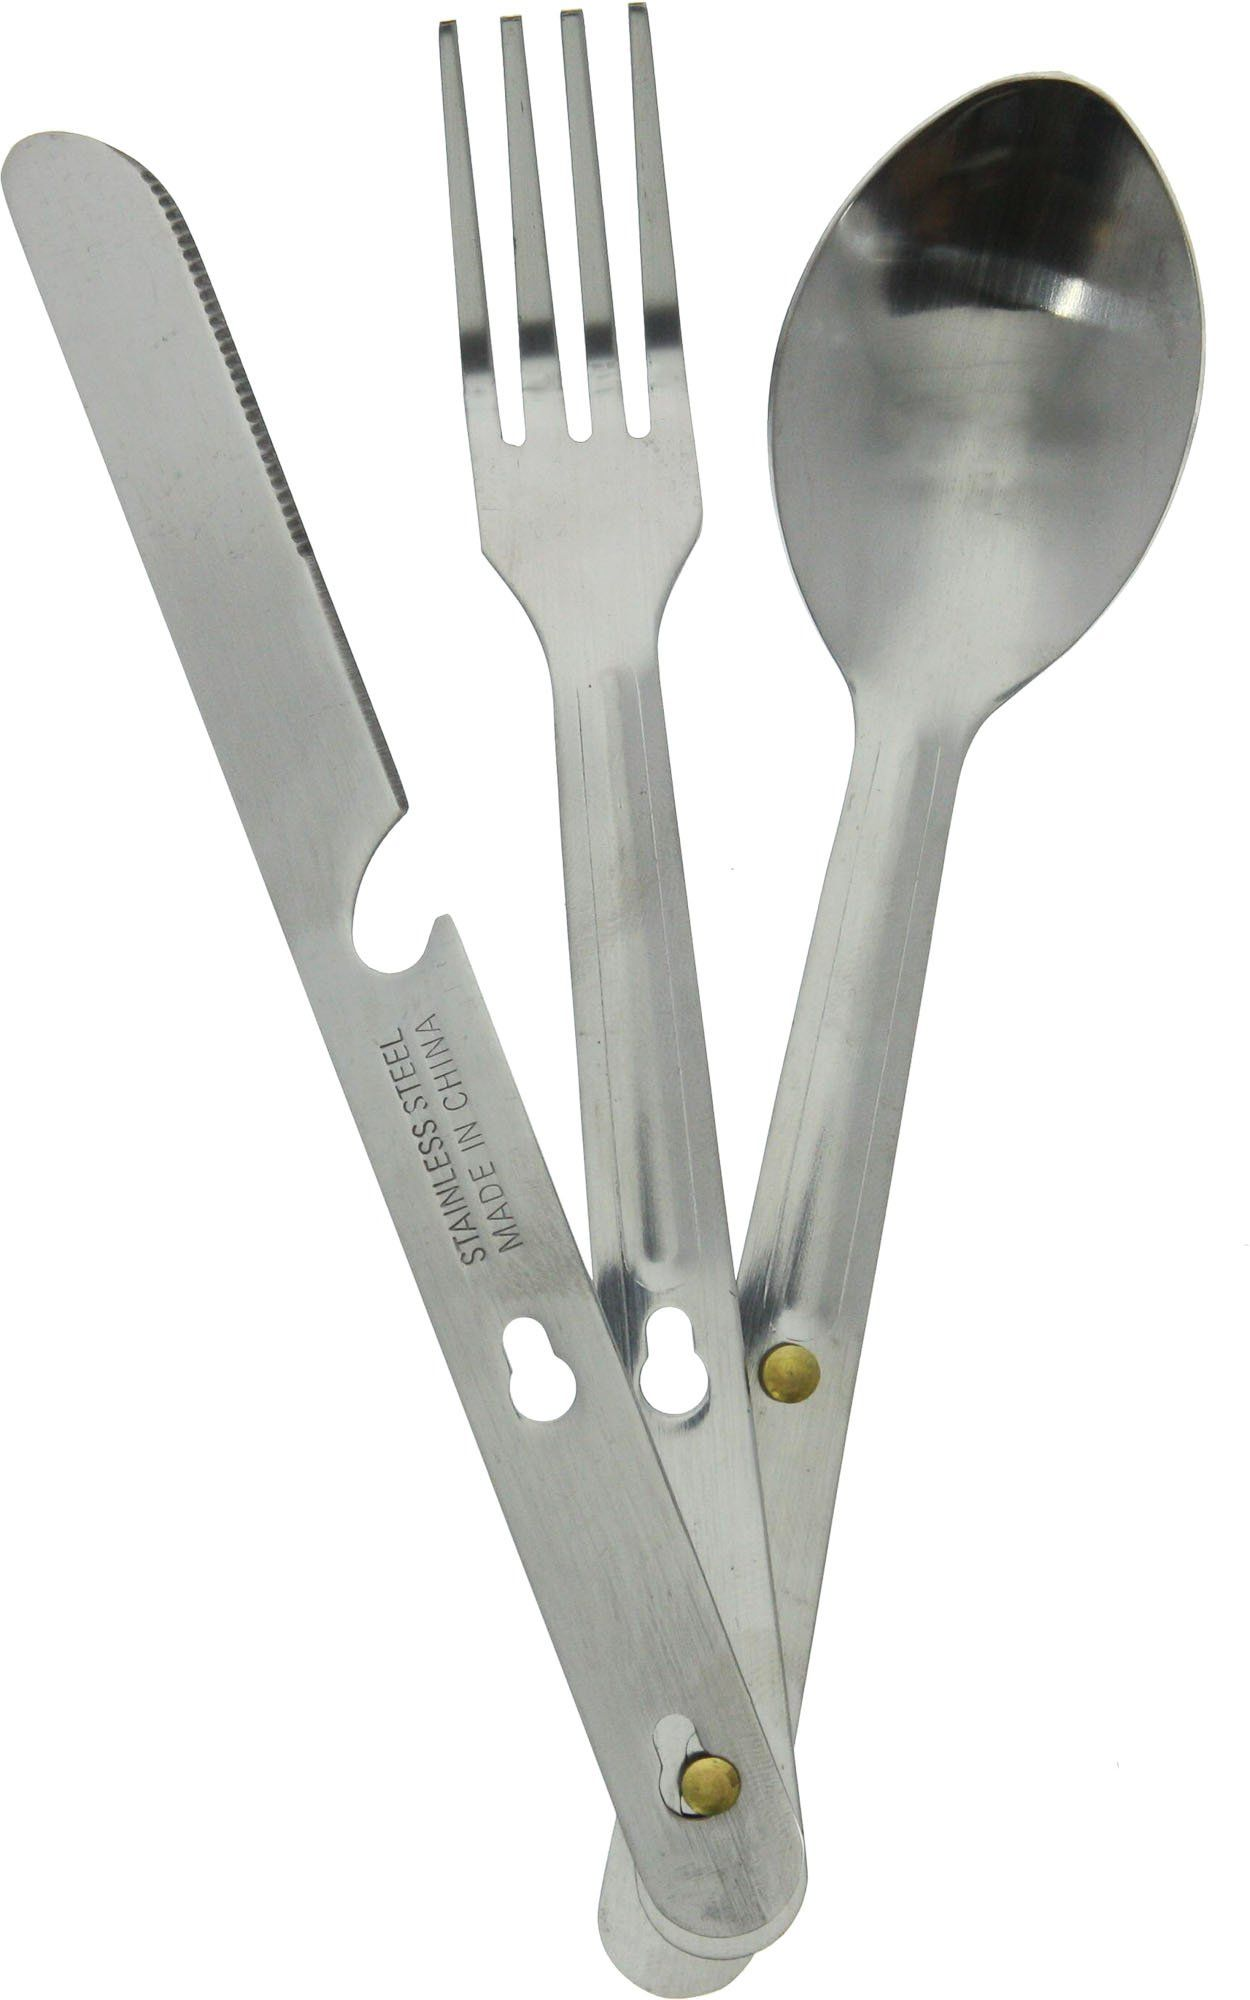 Amazon.com : 4 N 1 Stainless Steel Camping Hiking Emergency Eating Utensil Set, Knife, Fork, Bottle Opener & Spoon : Sports & Outdoors